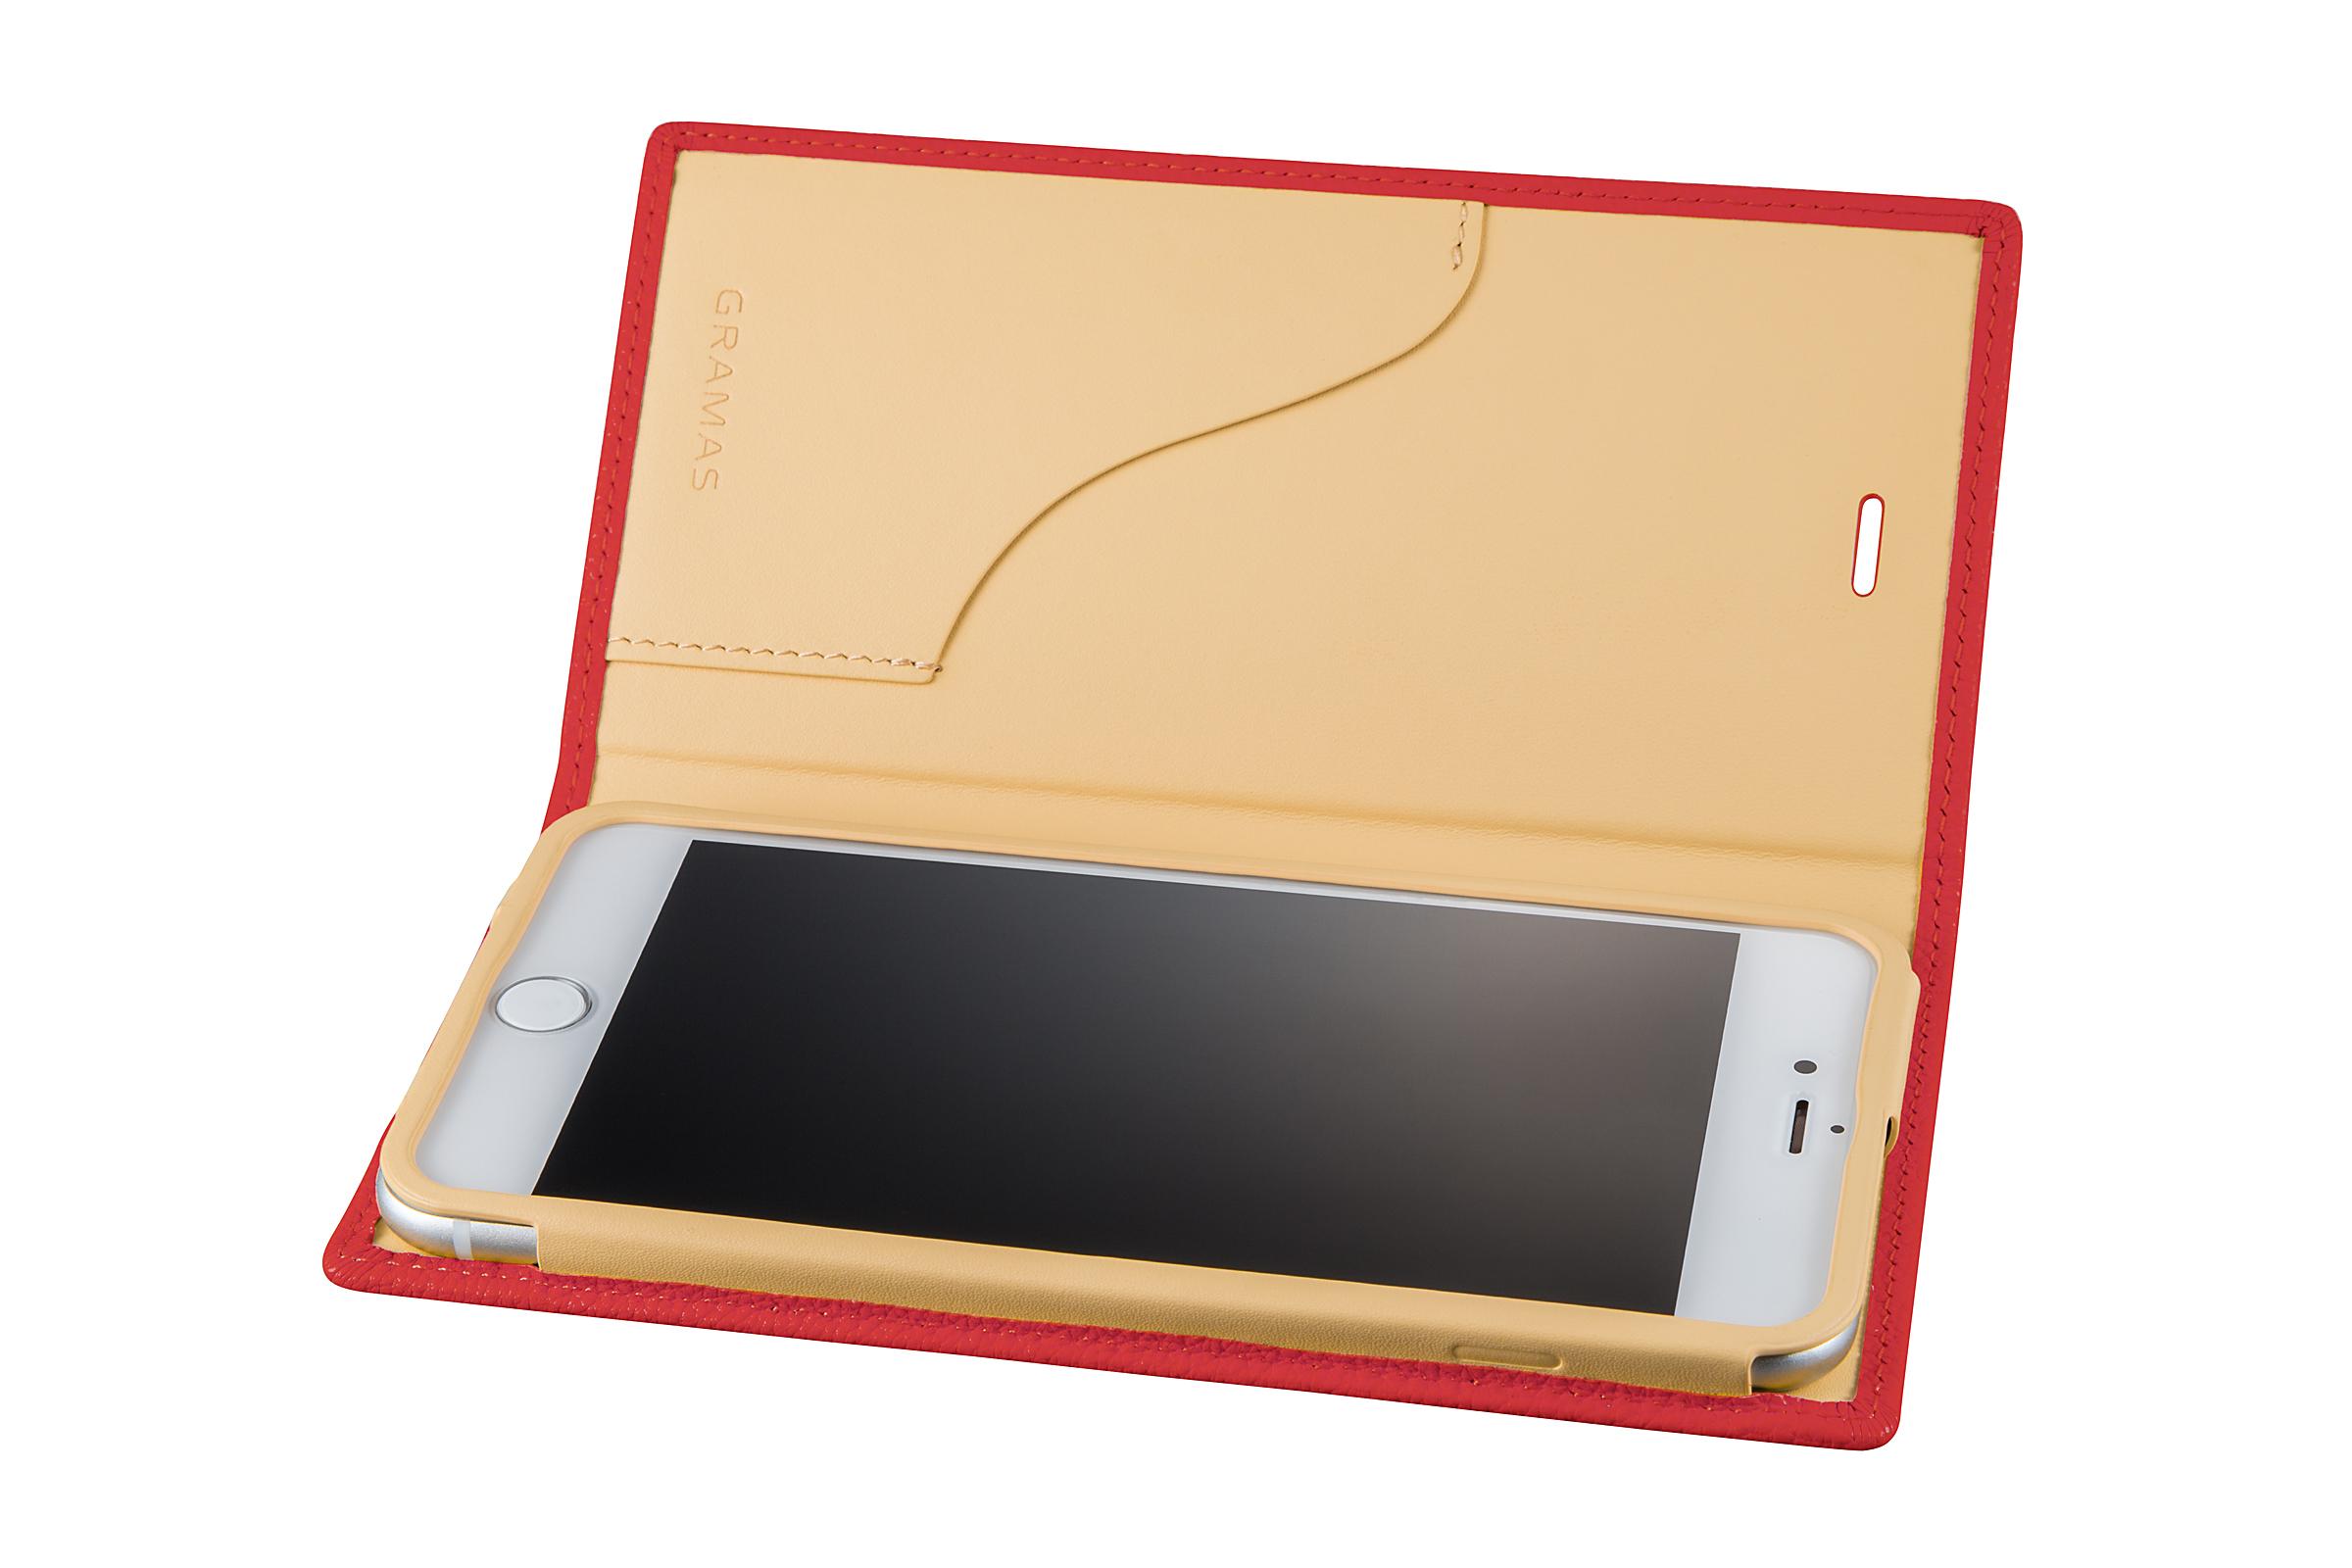 GRAMAS Shrunken-calf Full Leather Case for iPhone 7 Plus(Pink) シュランケンカーフ 手帳型フルレザーケース - 画像3